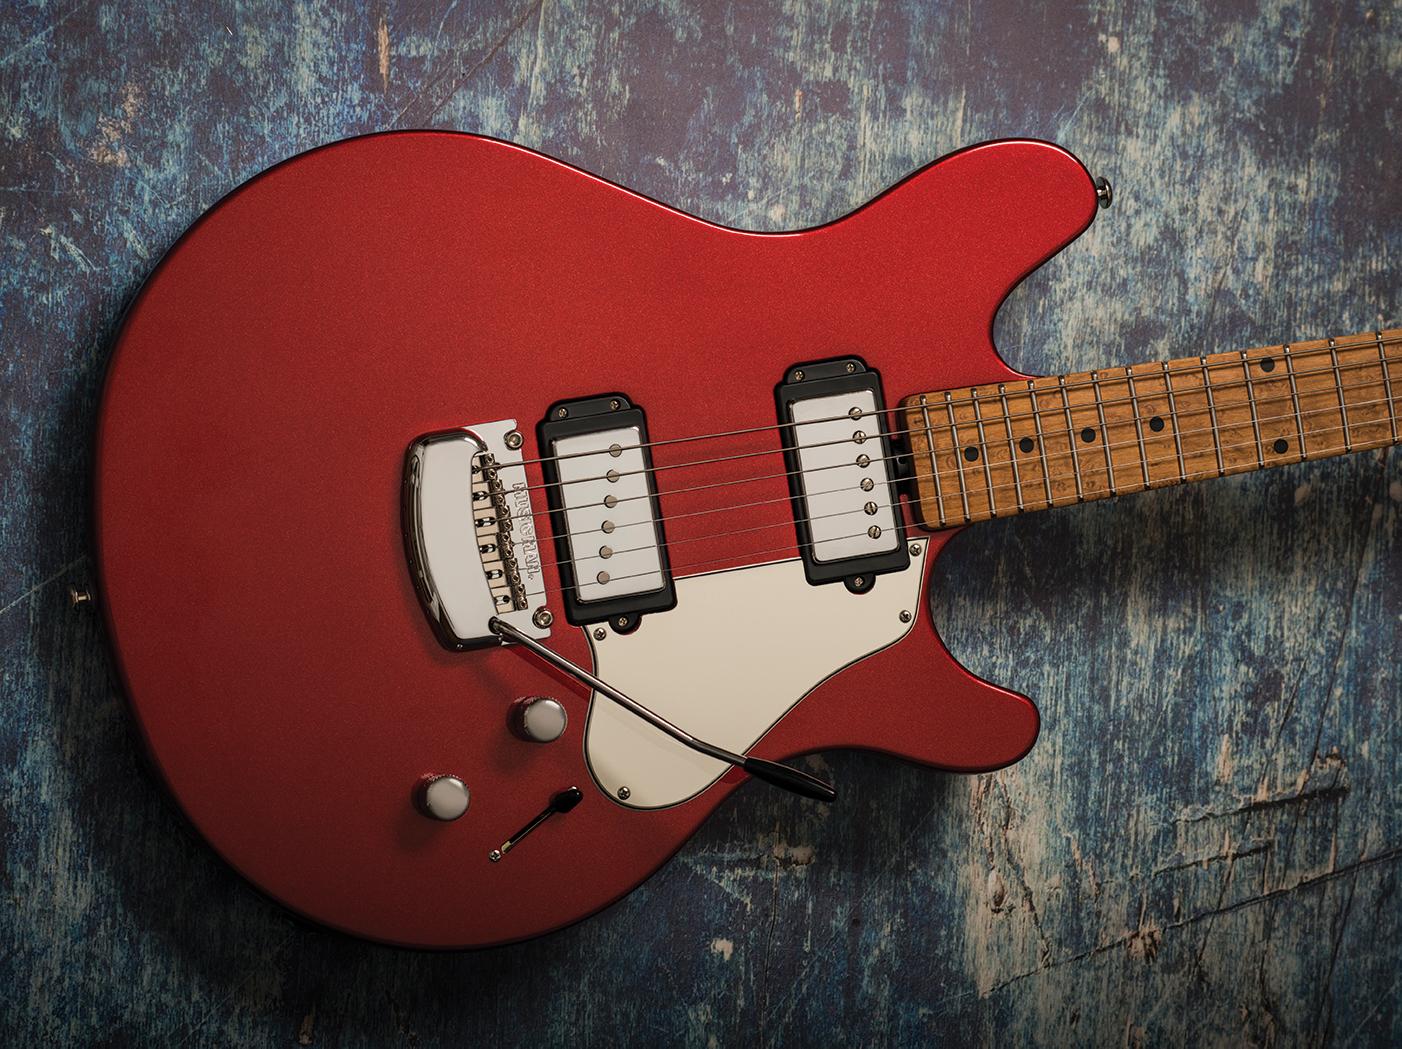 Music Man Valentine Tremolo Review - Guitar com | All Things Guitar